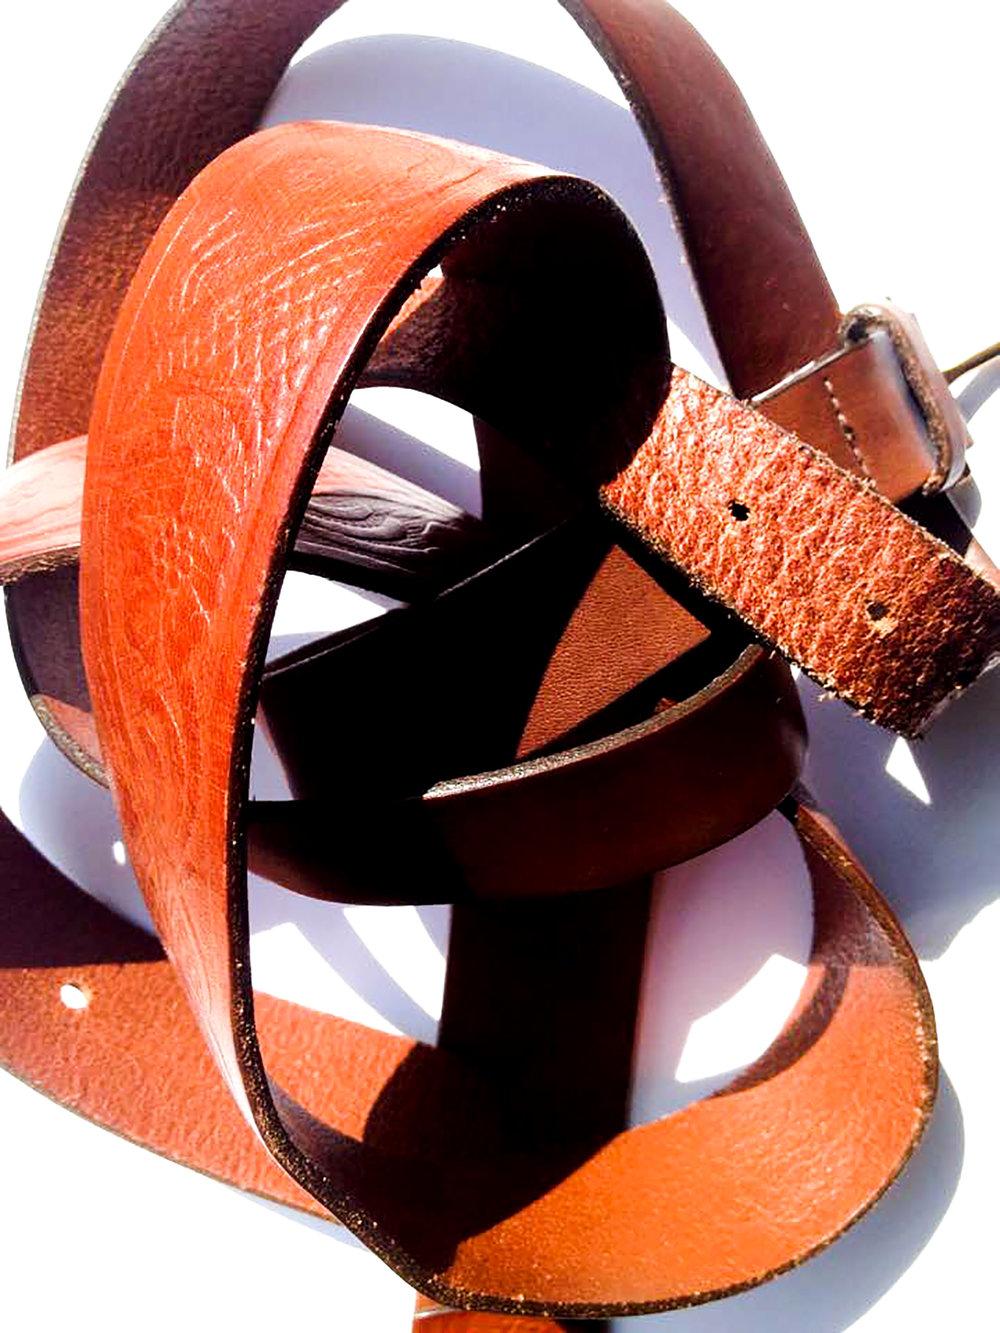 belt 1 (1 of 1).jpg